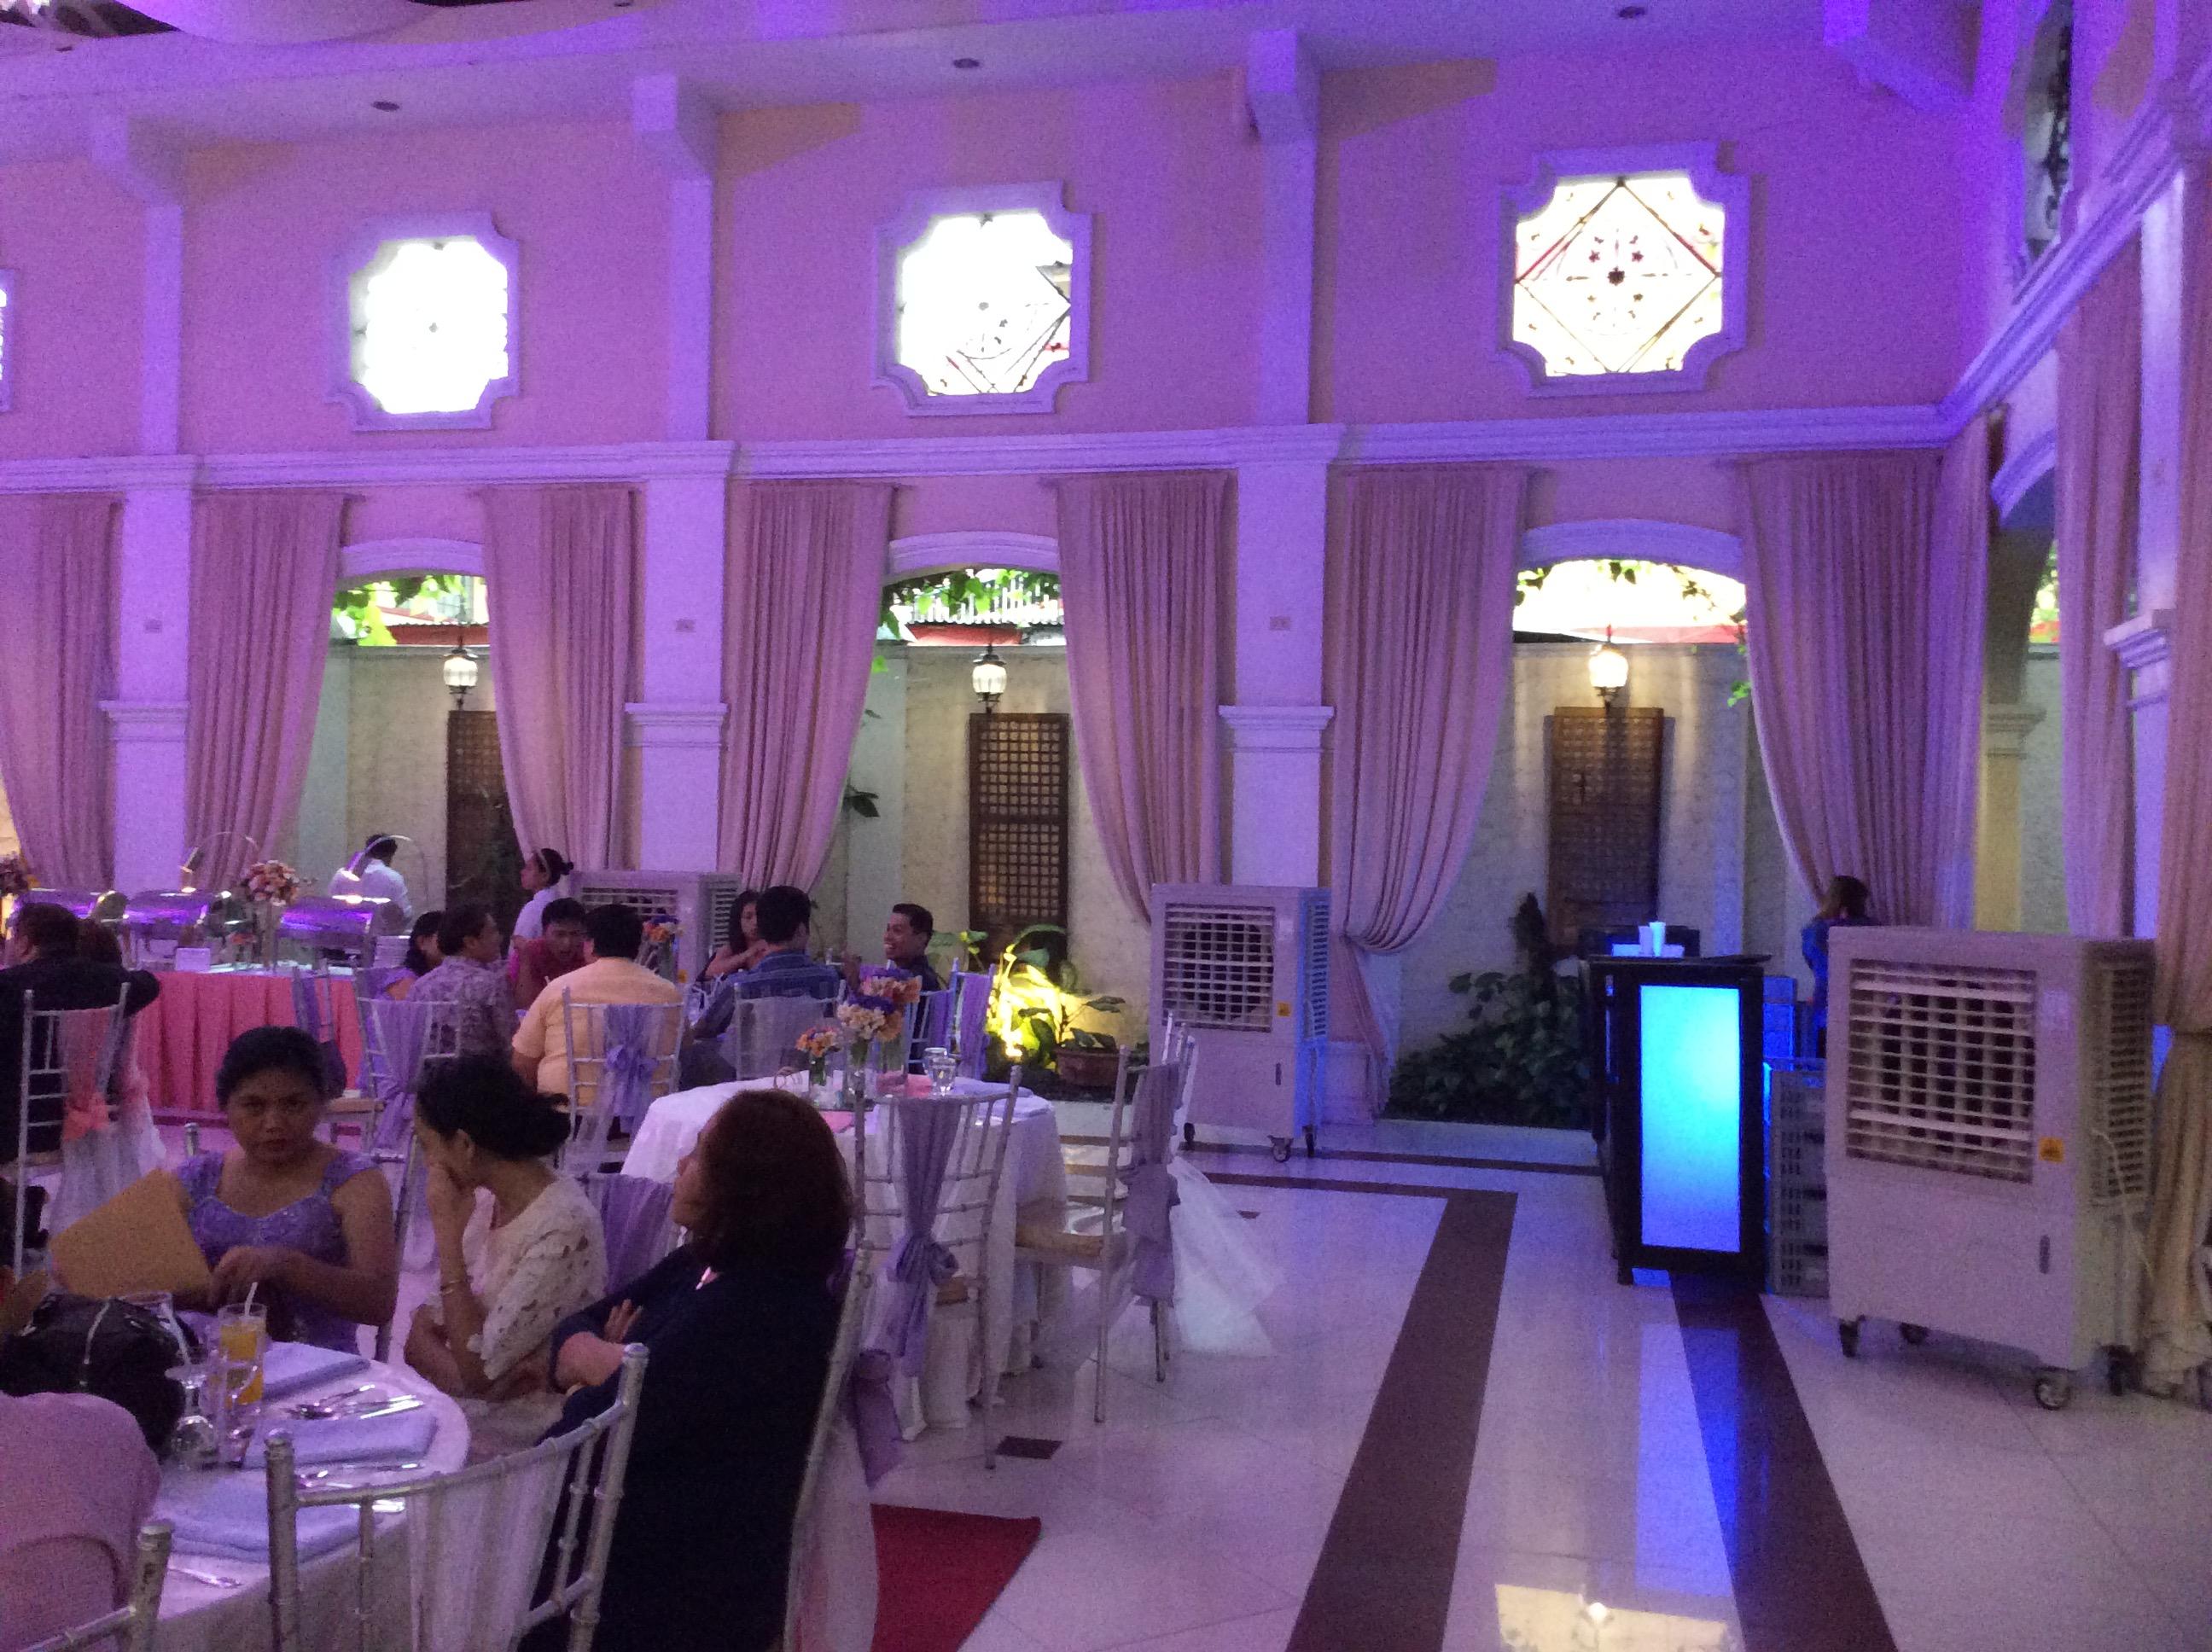 Wedding Supplier Review LA CASTELLANA Venue Budget Dream Wedding In The Philippines